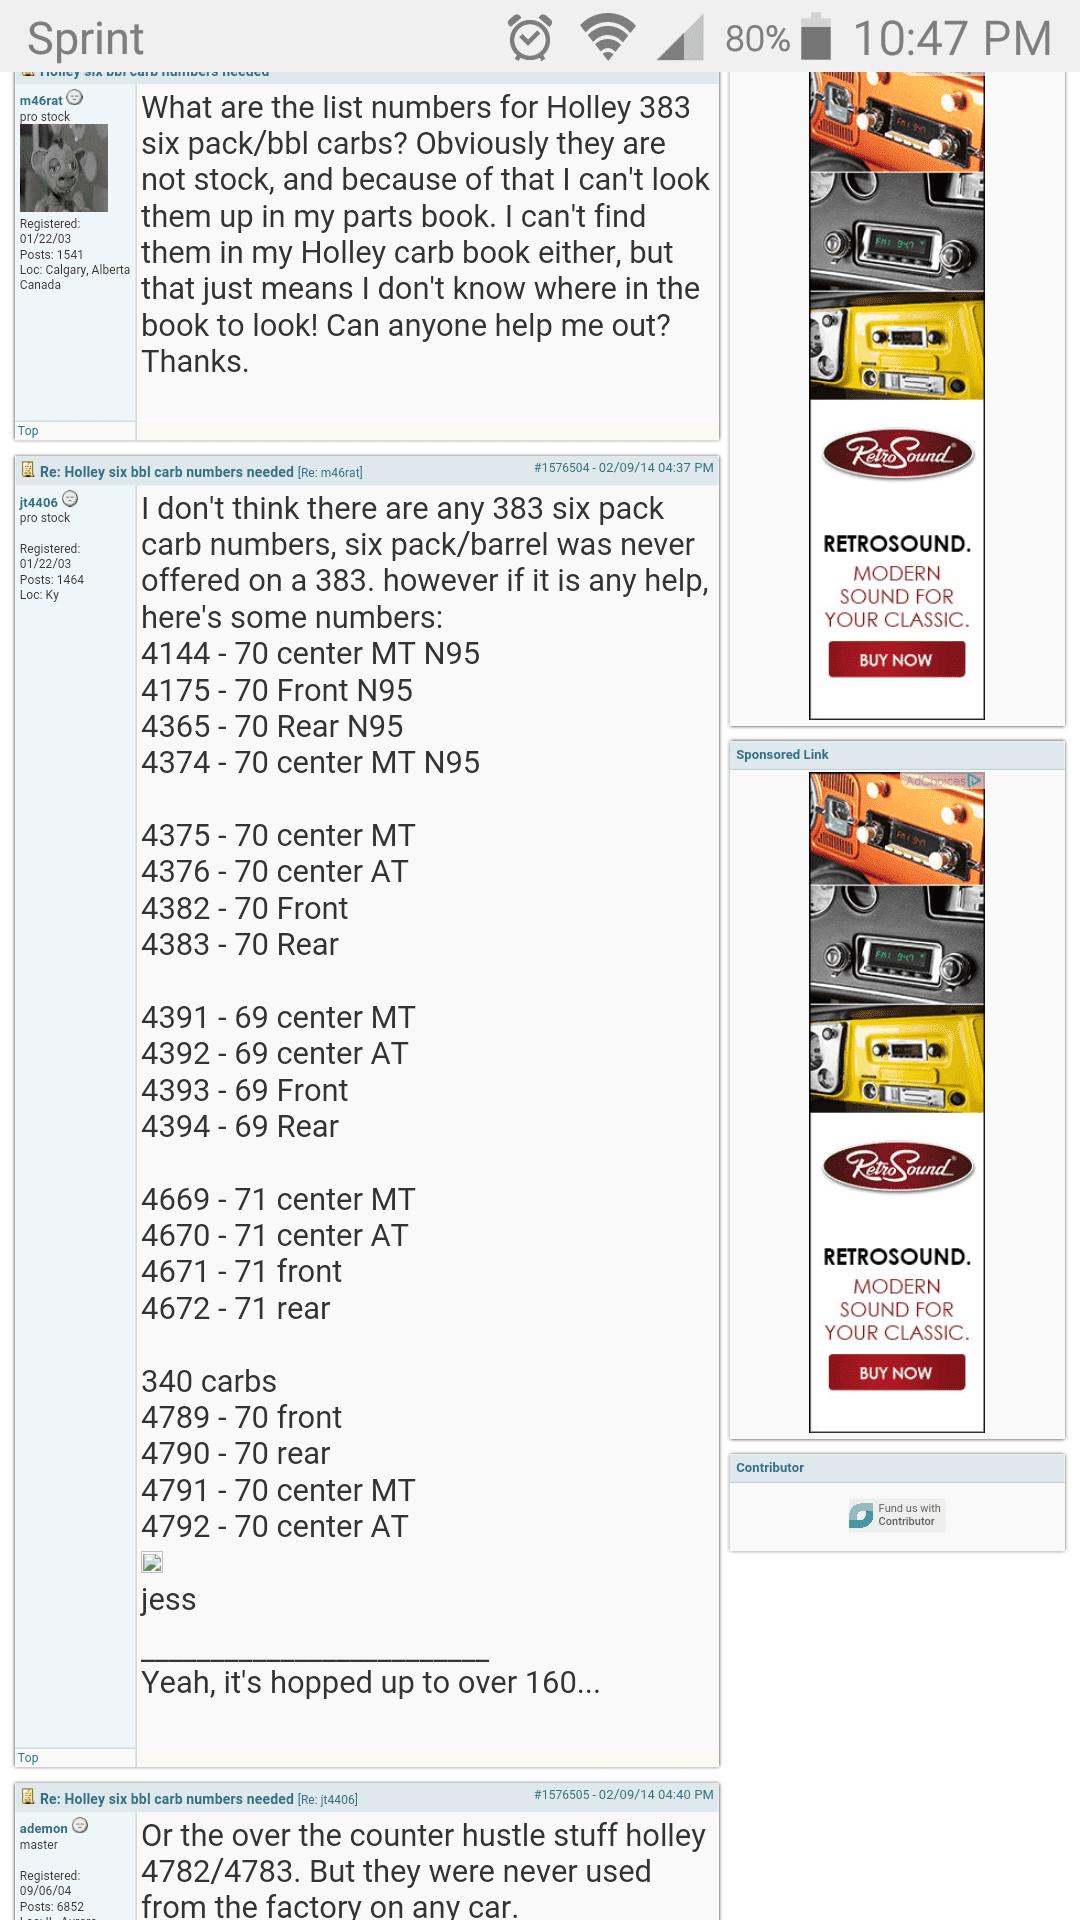 Screenshot_2016-08-17-22-47-20.png